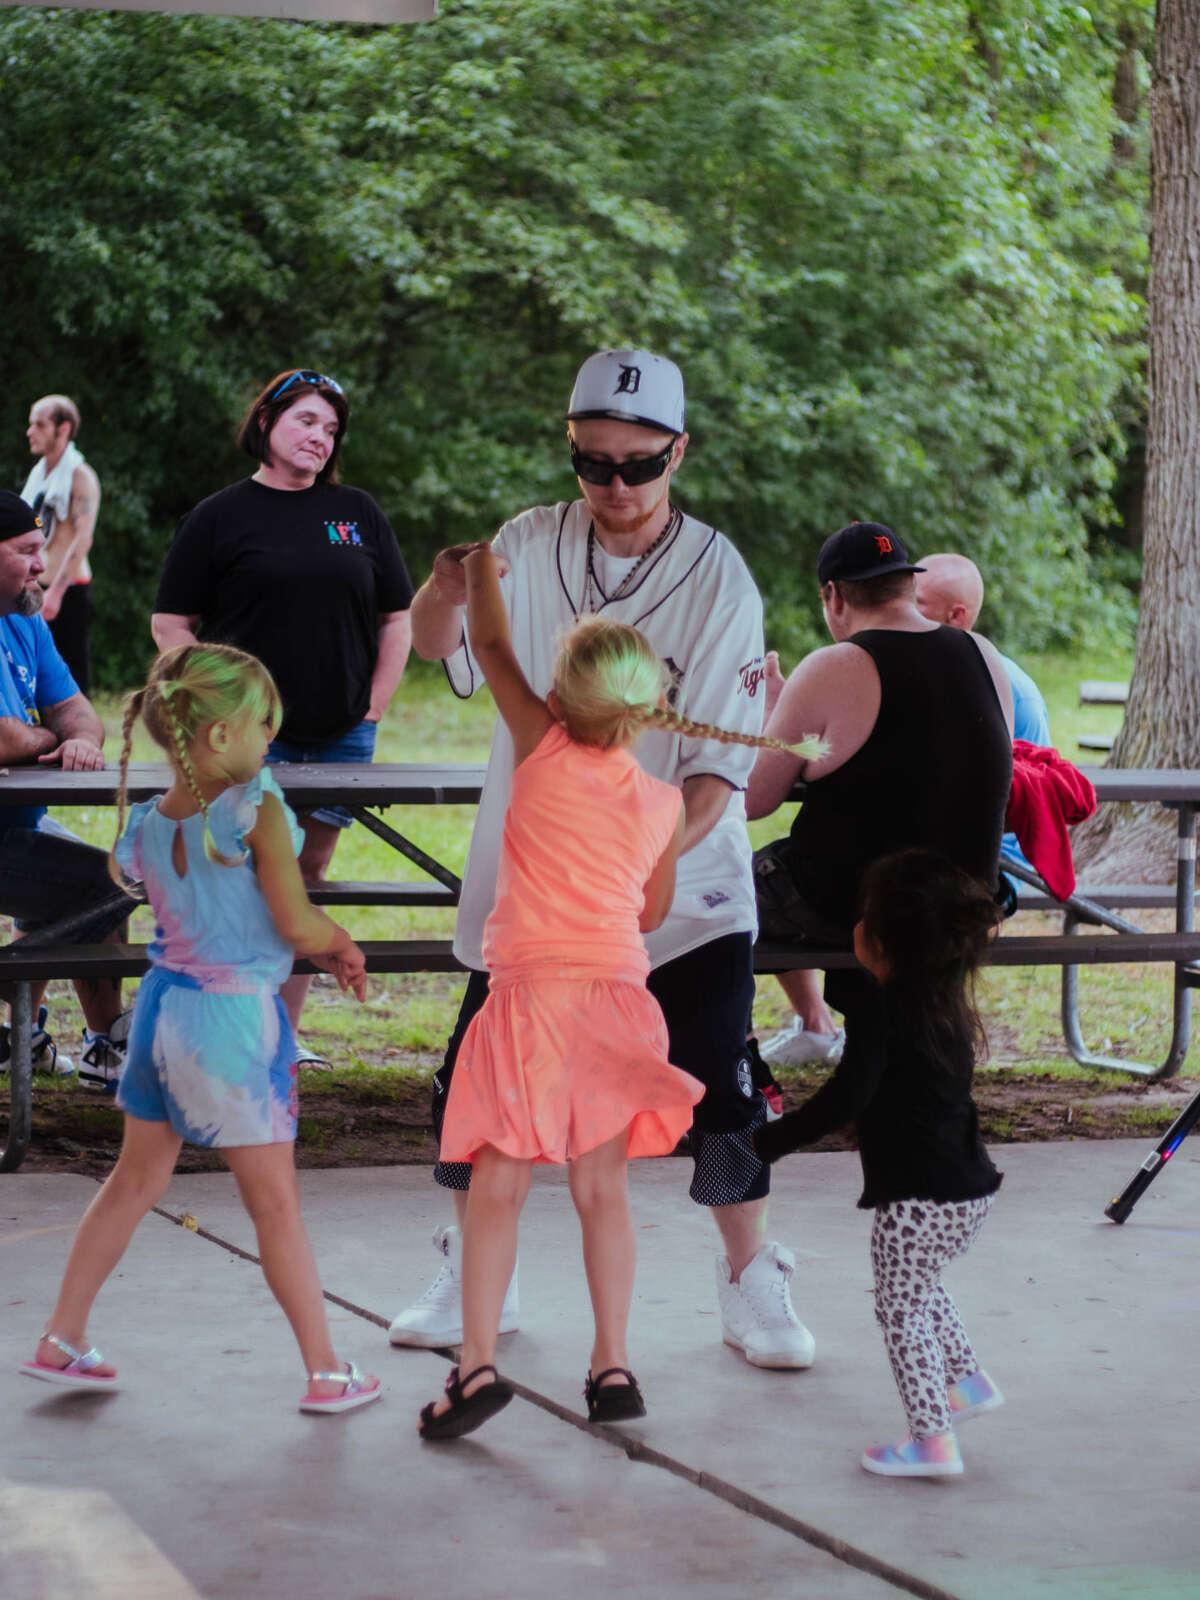 Austin Banks dances with visitors at a past Party at the Pavilion.